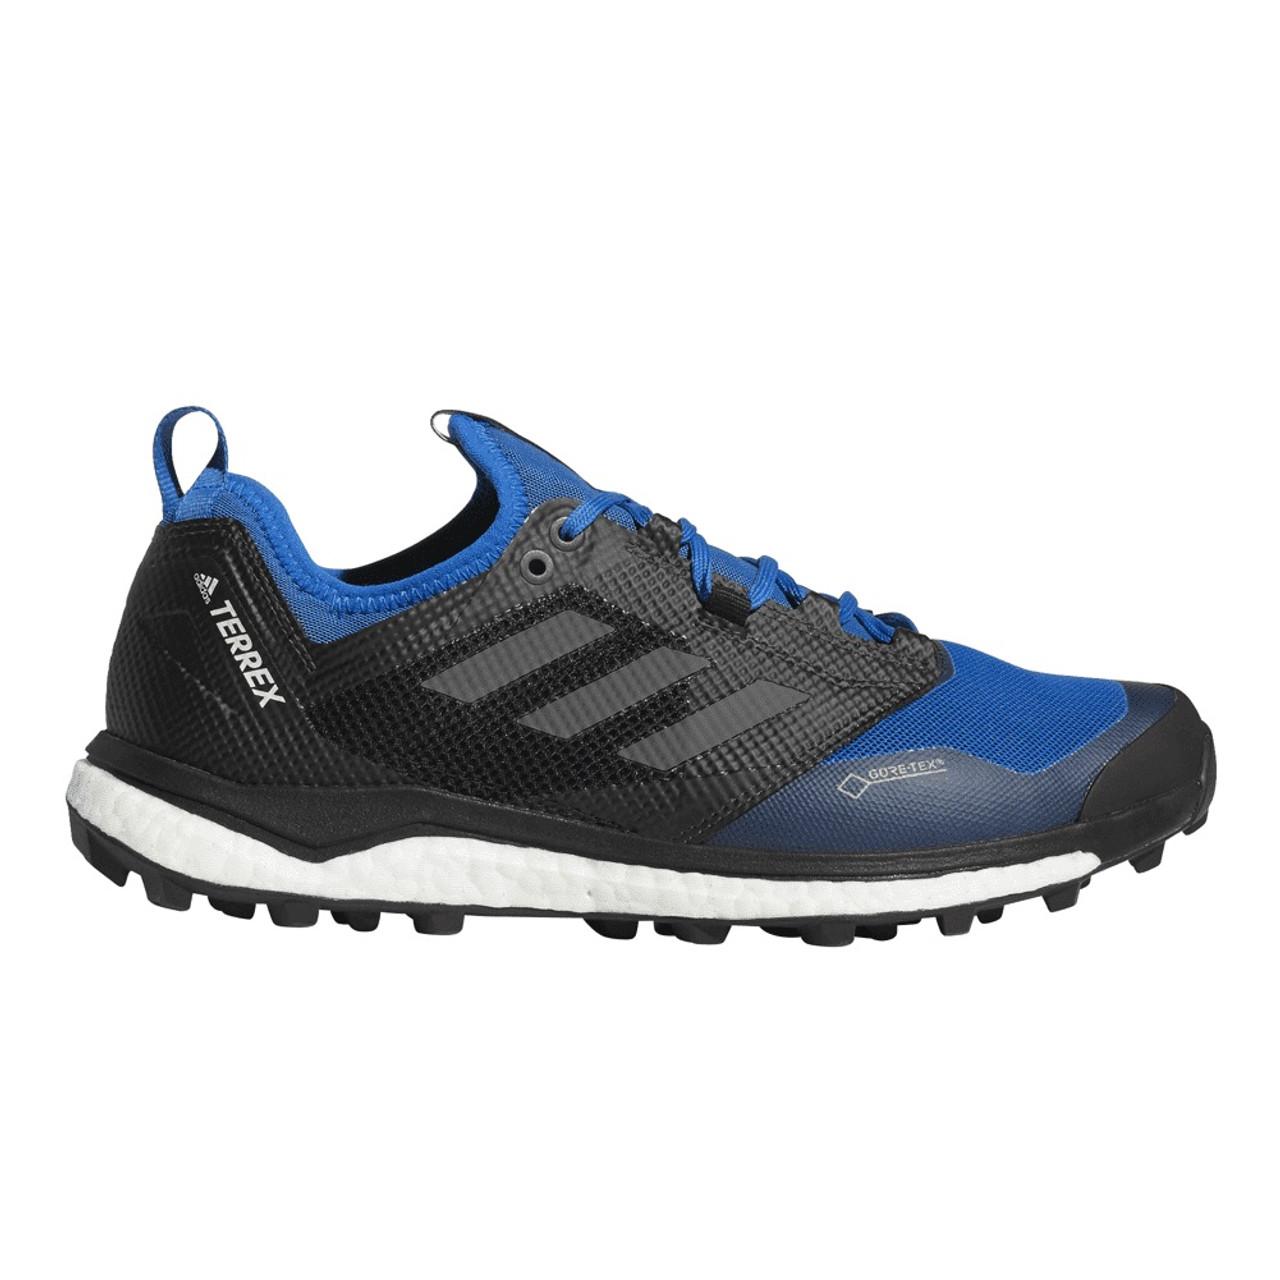 separation shoes 3f15b 4e465 ... Adidas Terrex Agravic XT GTX Mens Black Grey Blue ...